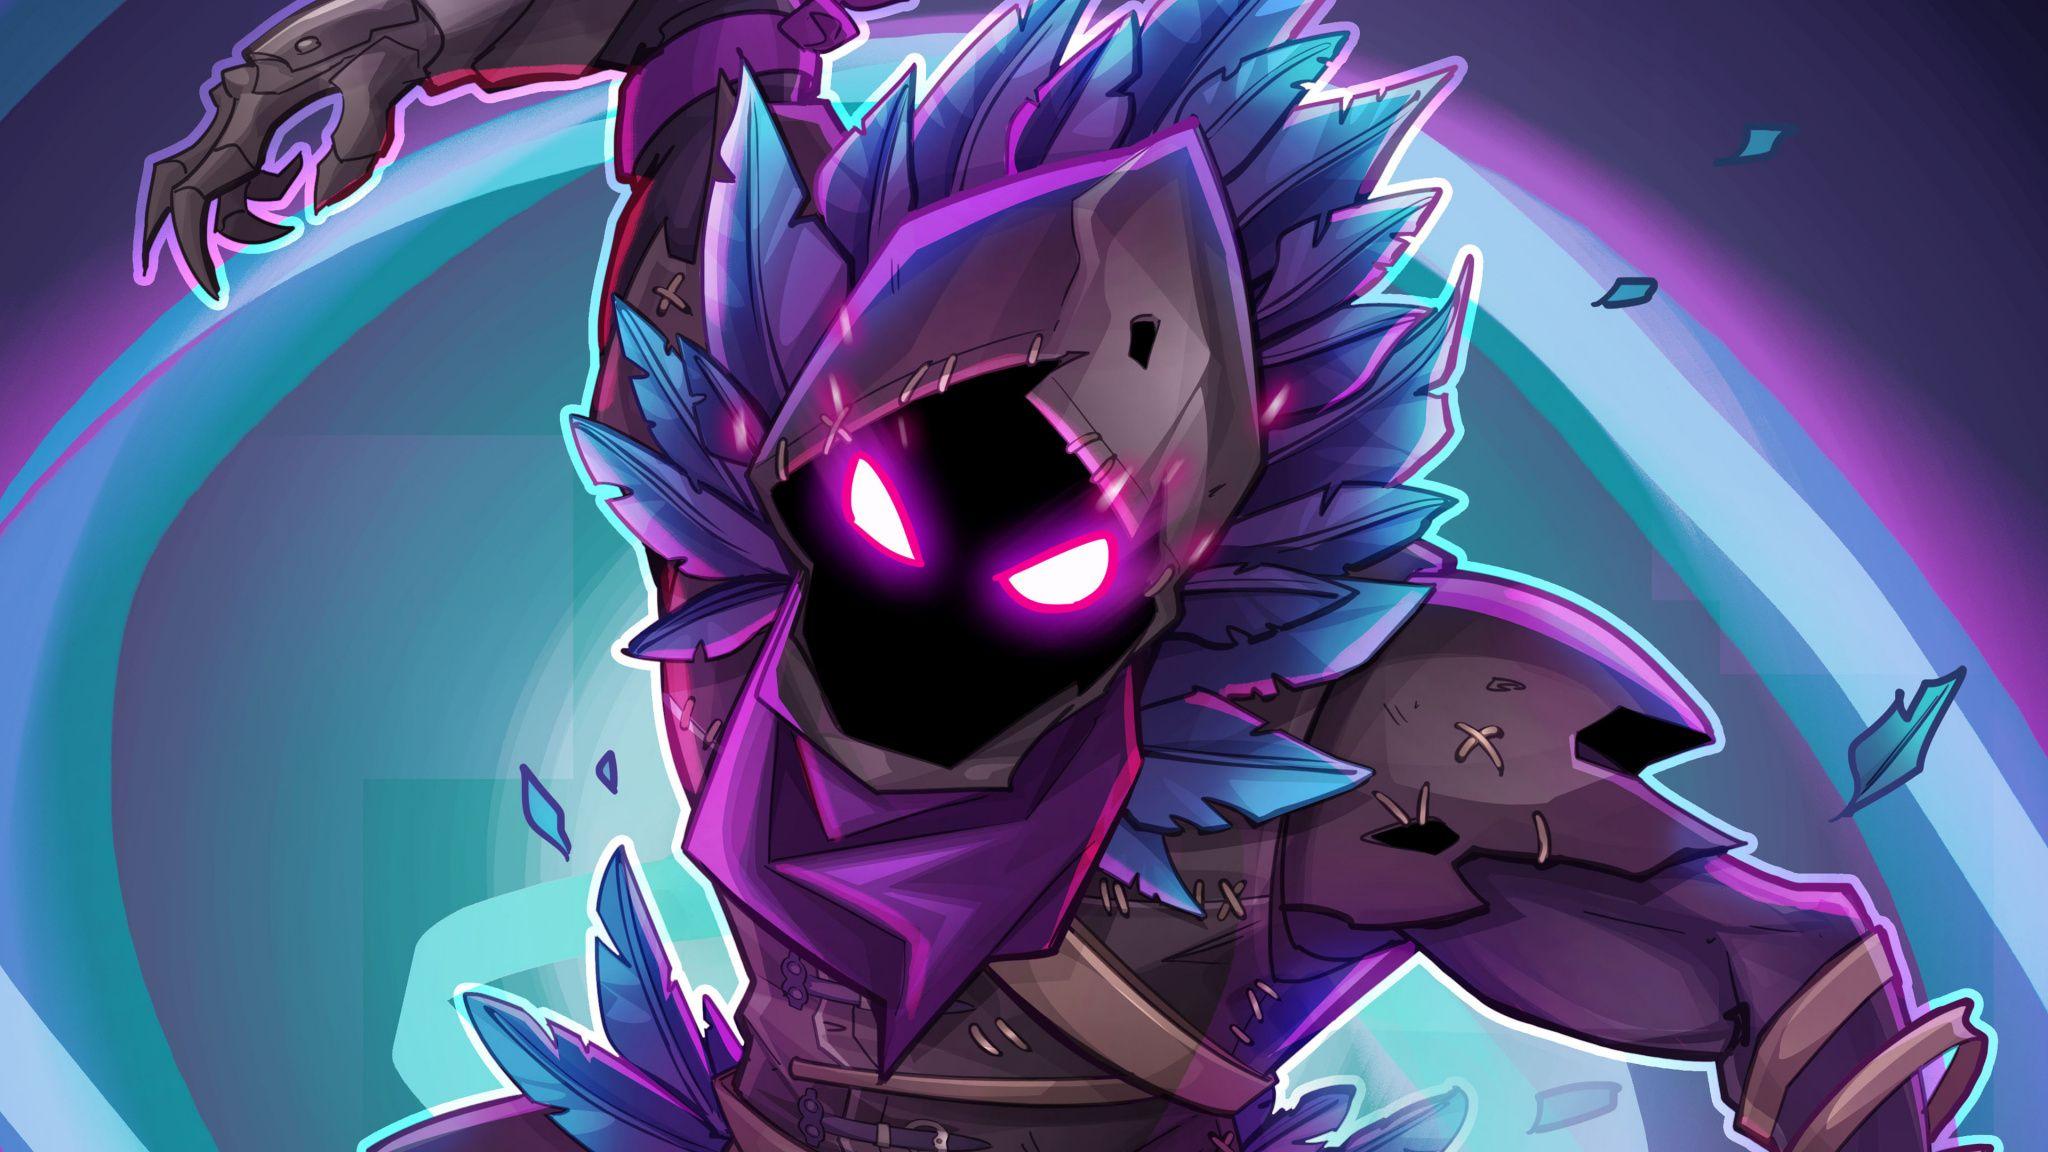 Raven, Fortnite Battle Royale, creature, game, 2048x1152